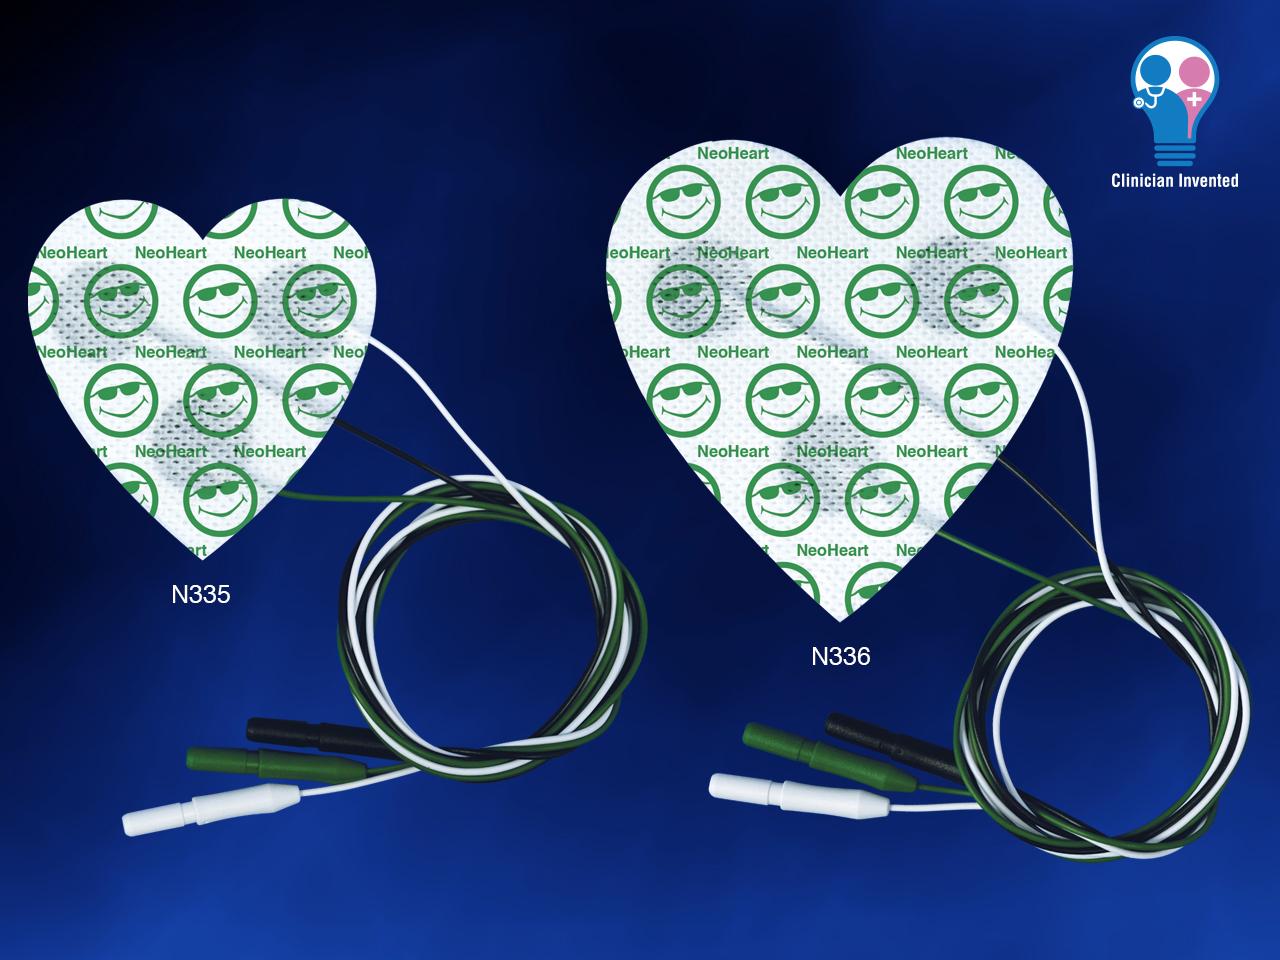 NeoHeart ECG Pad Family